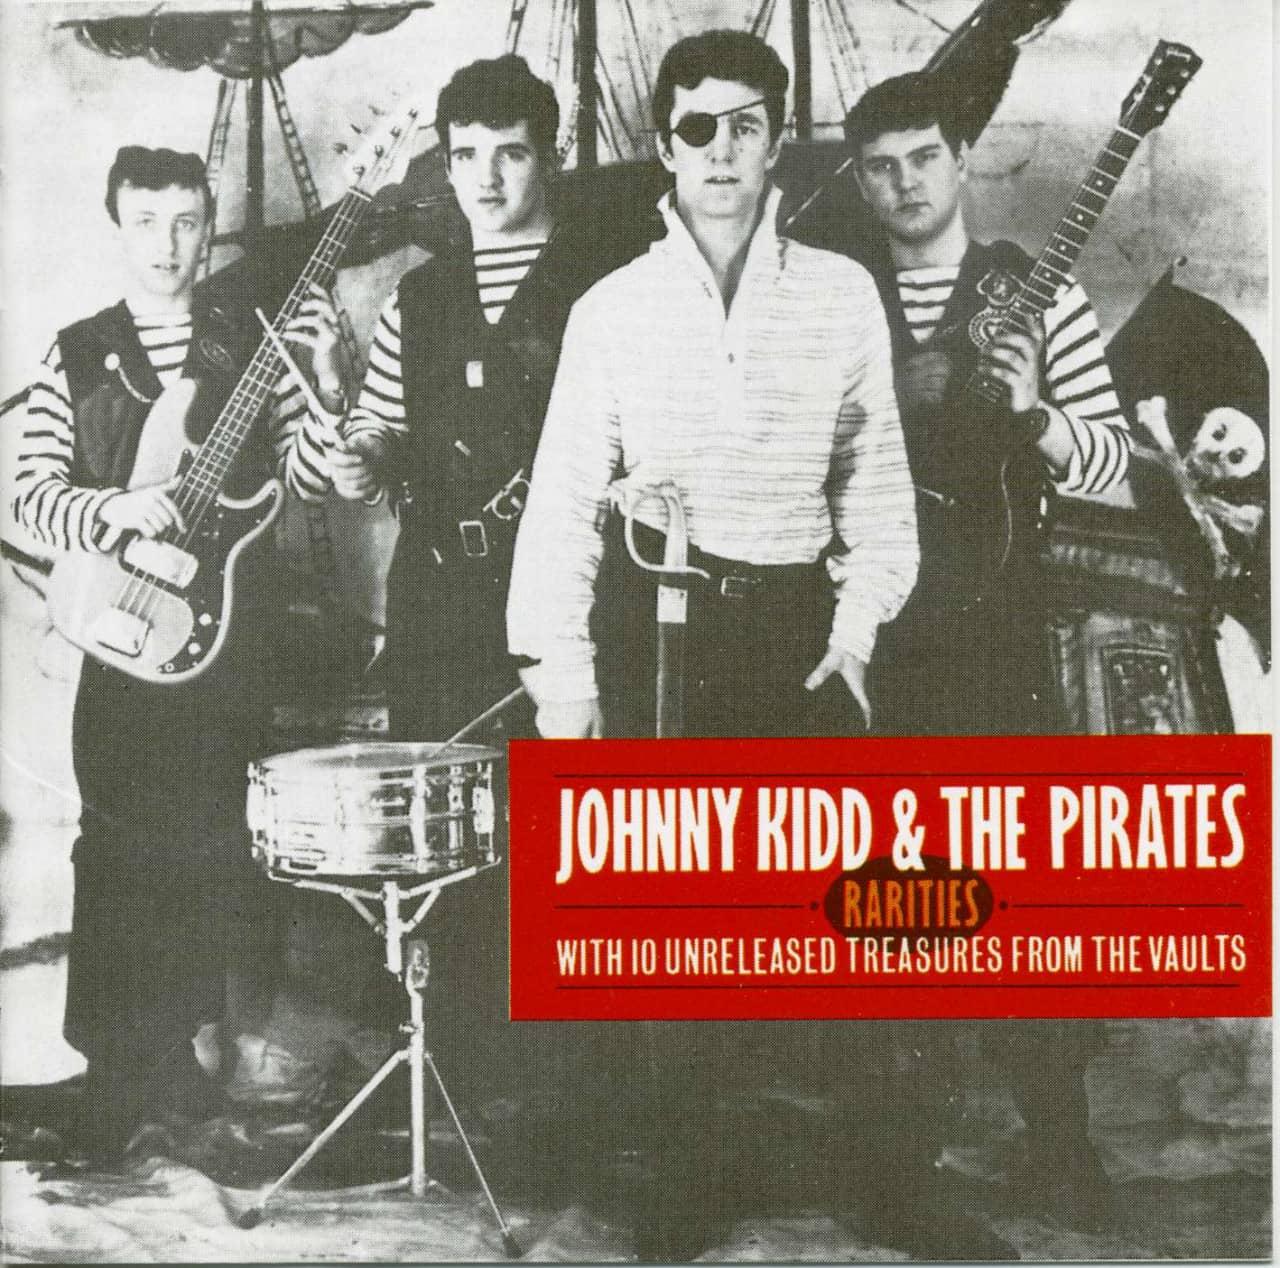 Johnny Kidd & The Pirates - Rarities 1961-1966 (CD)